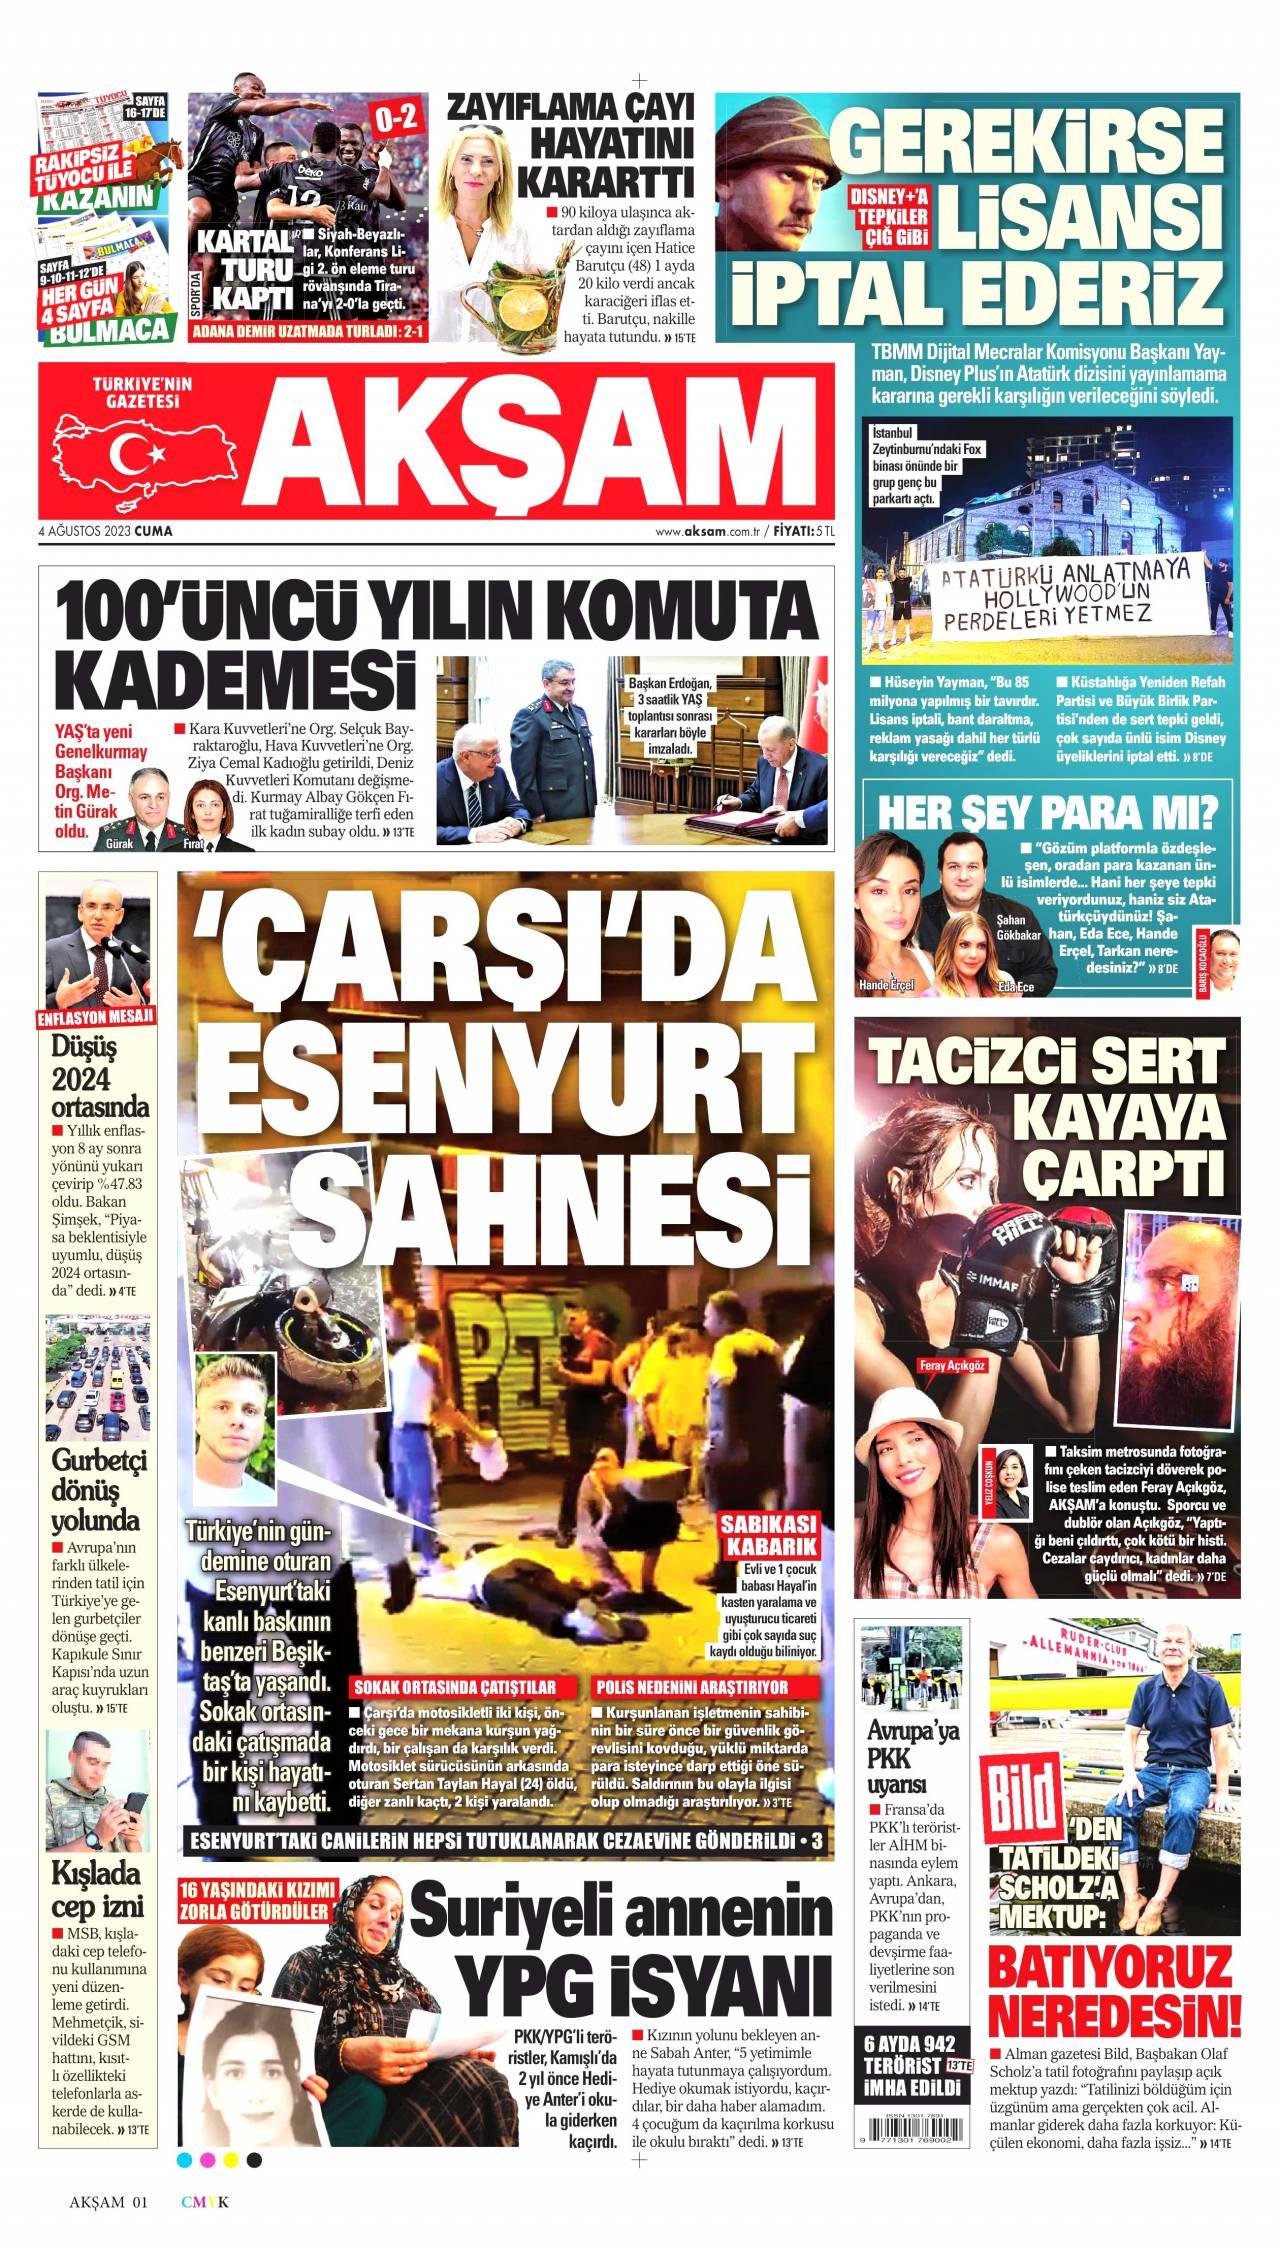 20 Ocak 2019, Pazar aksam Gazetesi